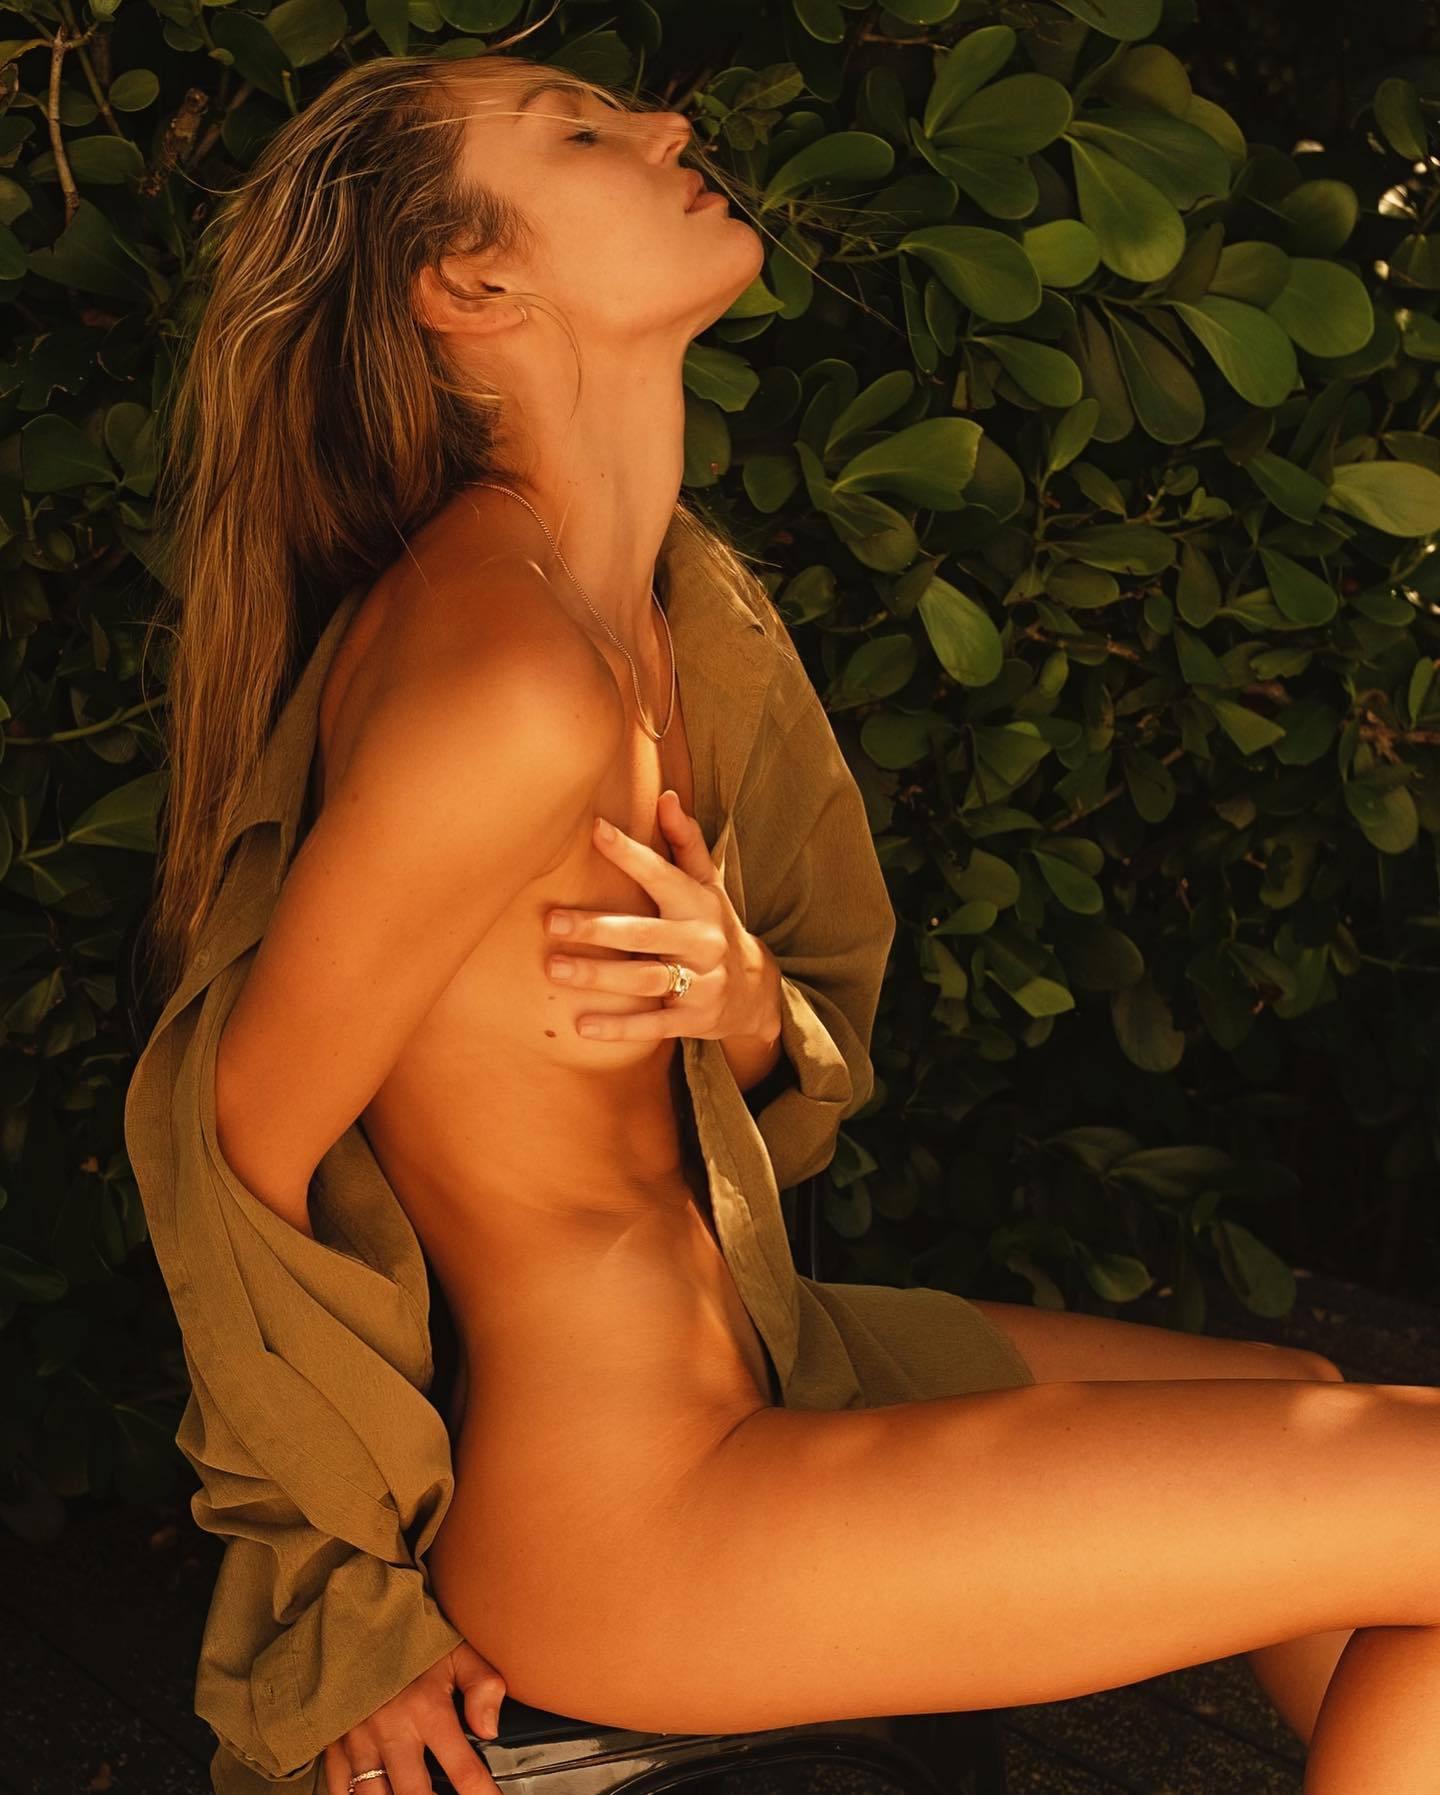 Candice Swanepoel Topless Hand Bra